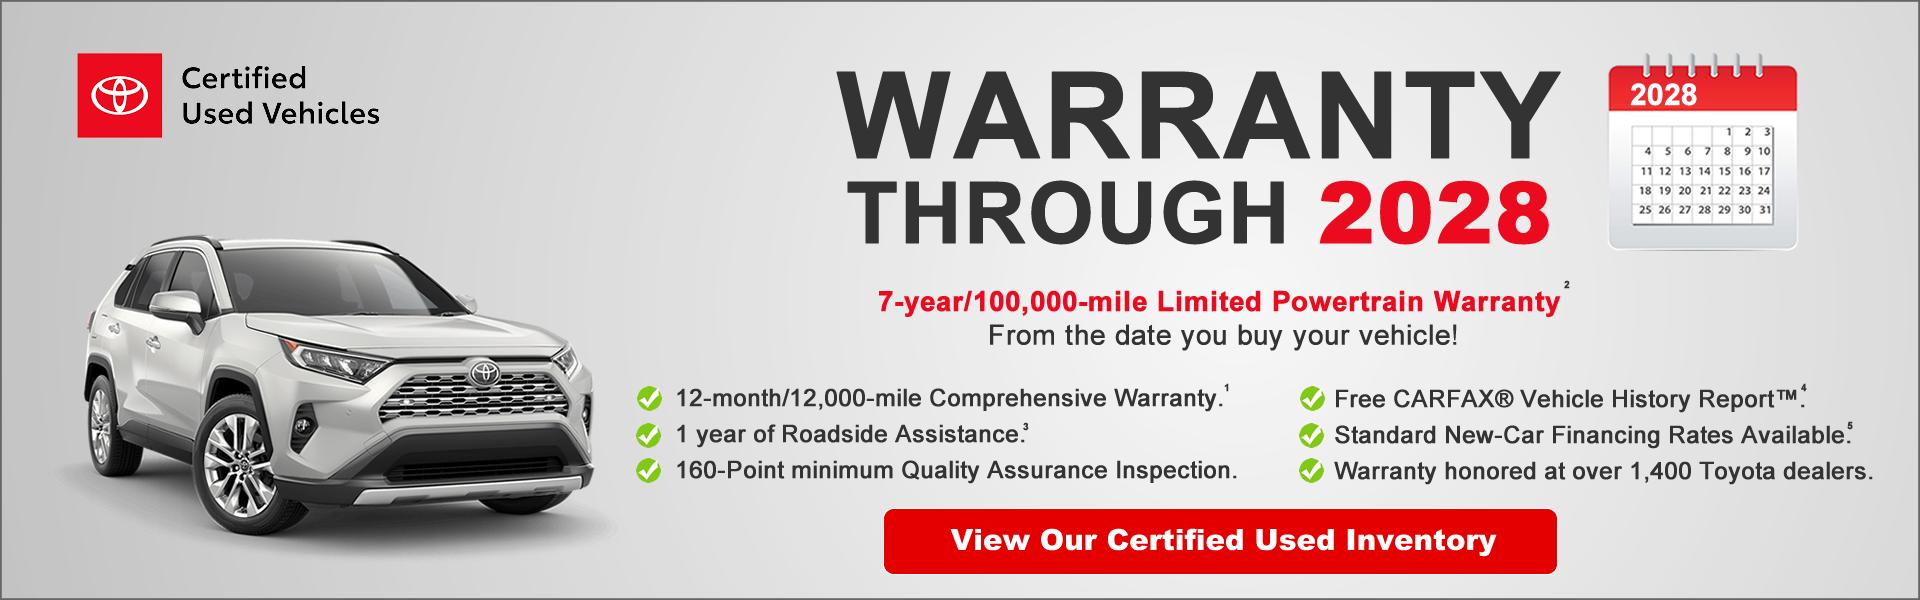 TCUV Warranty 2028